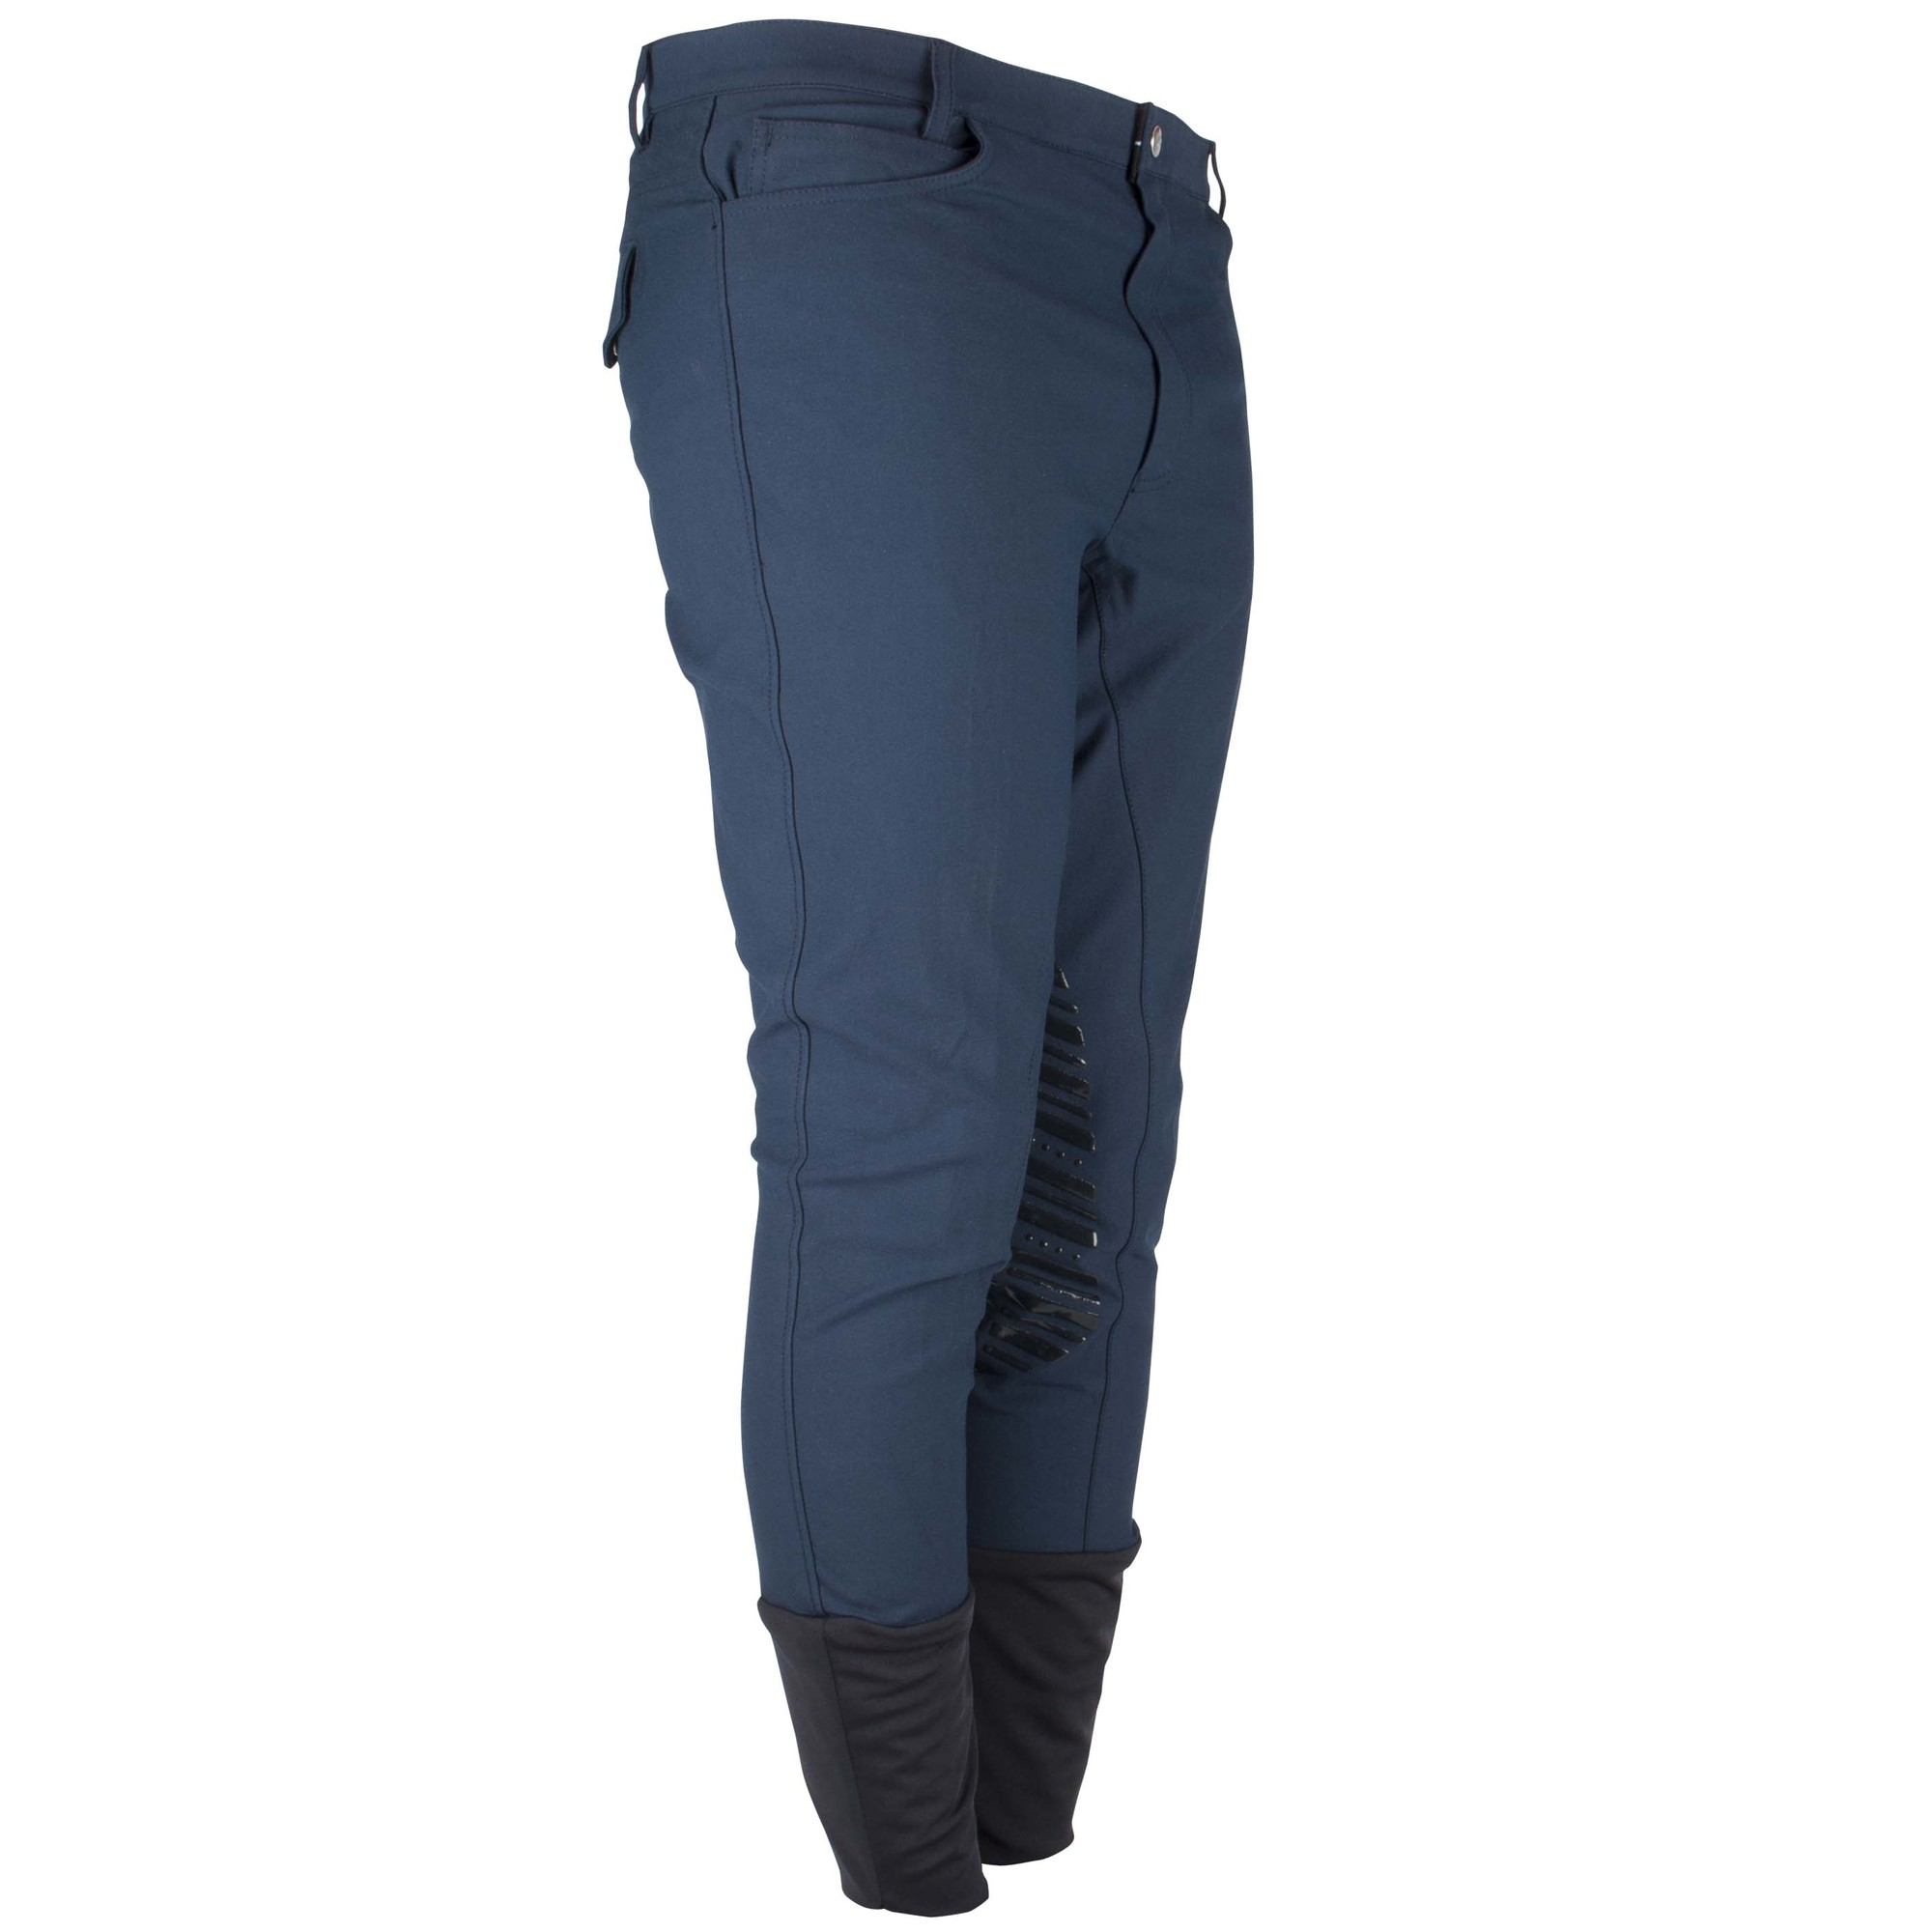 Mondoni Lorenzo Grip H. rijbroek donkerblauw maat:48